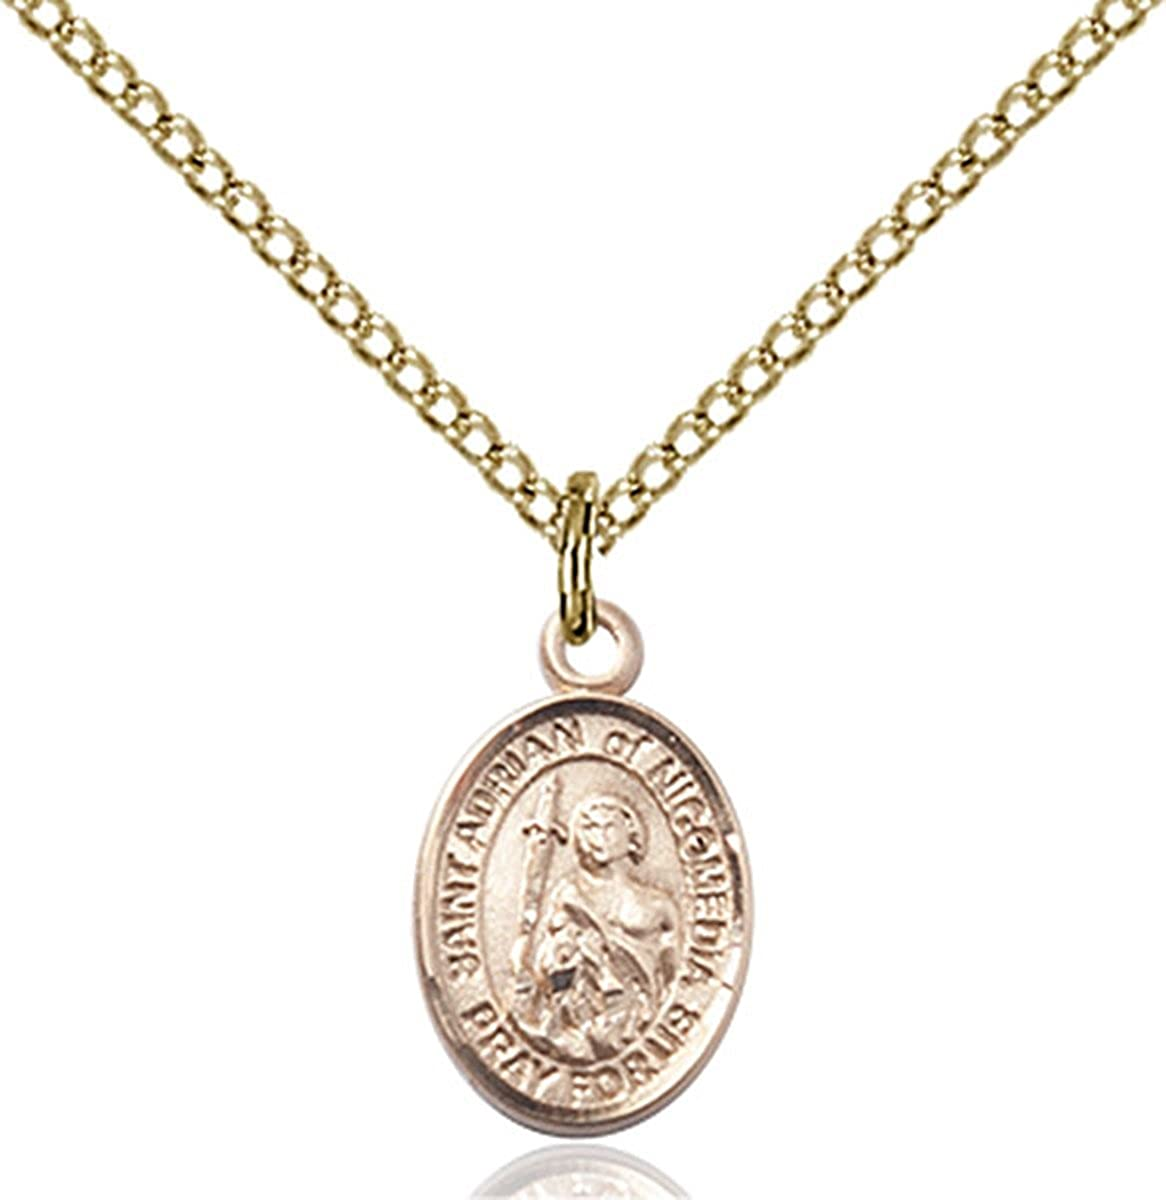 14KT Gold Filled Catholic Patron Saint Max Detroit Mall 70% OFF 1 Medal Petite 2 Charm I